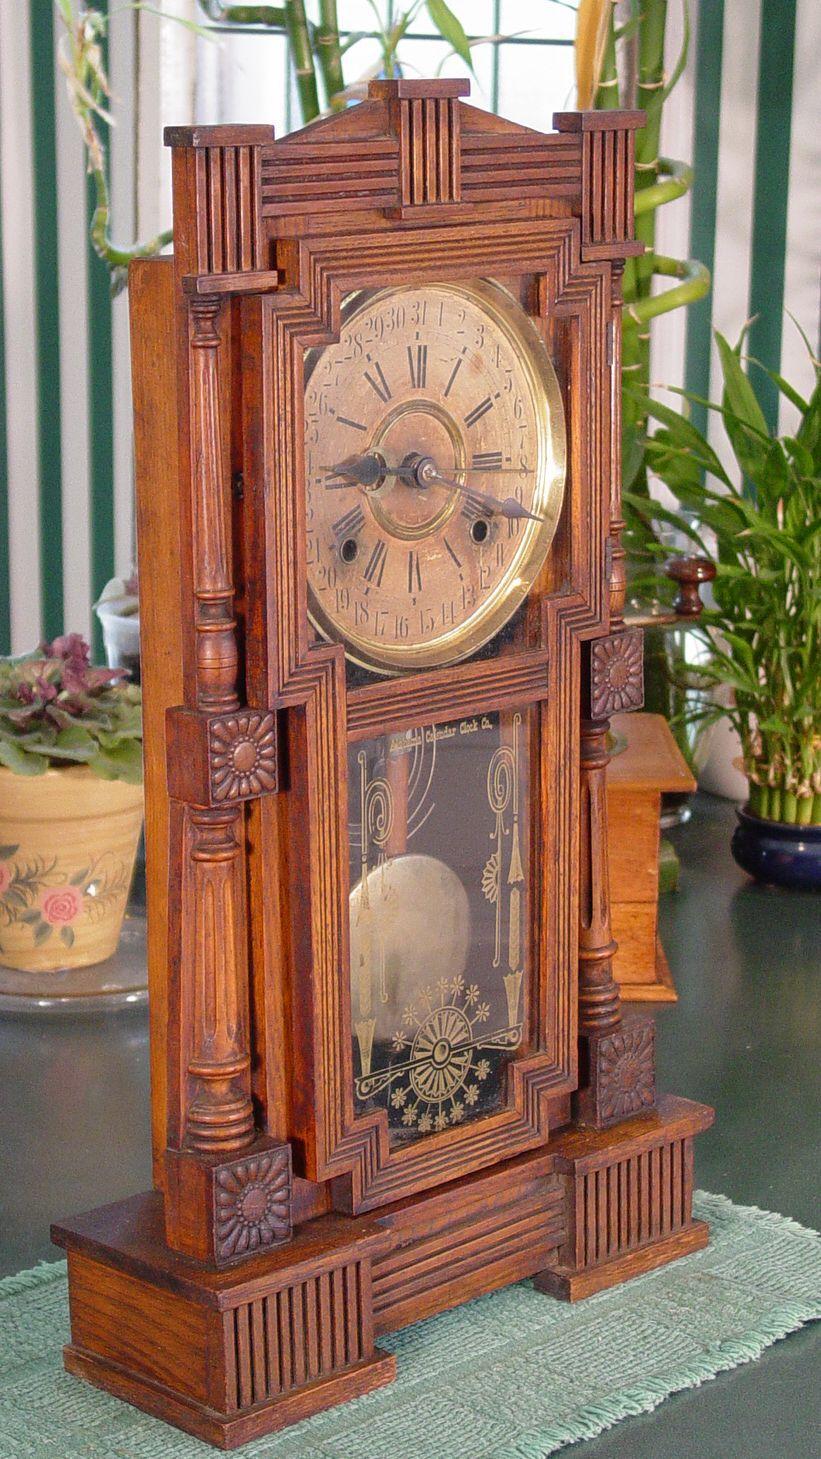 Pin By Lionel Koh On Tick Tock Antique Clocks Clock Antique Clock